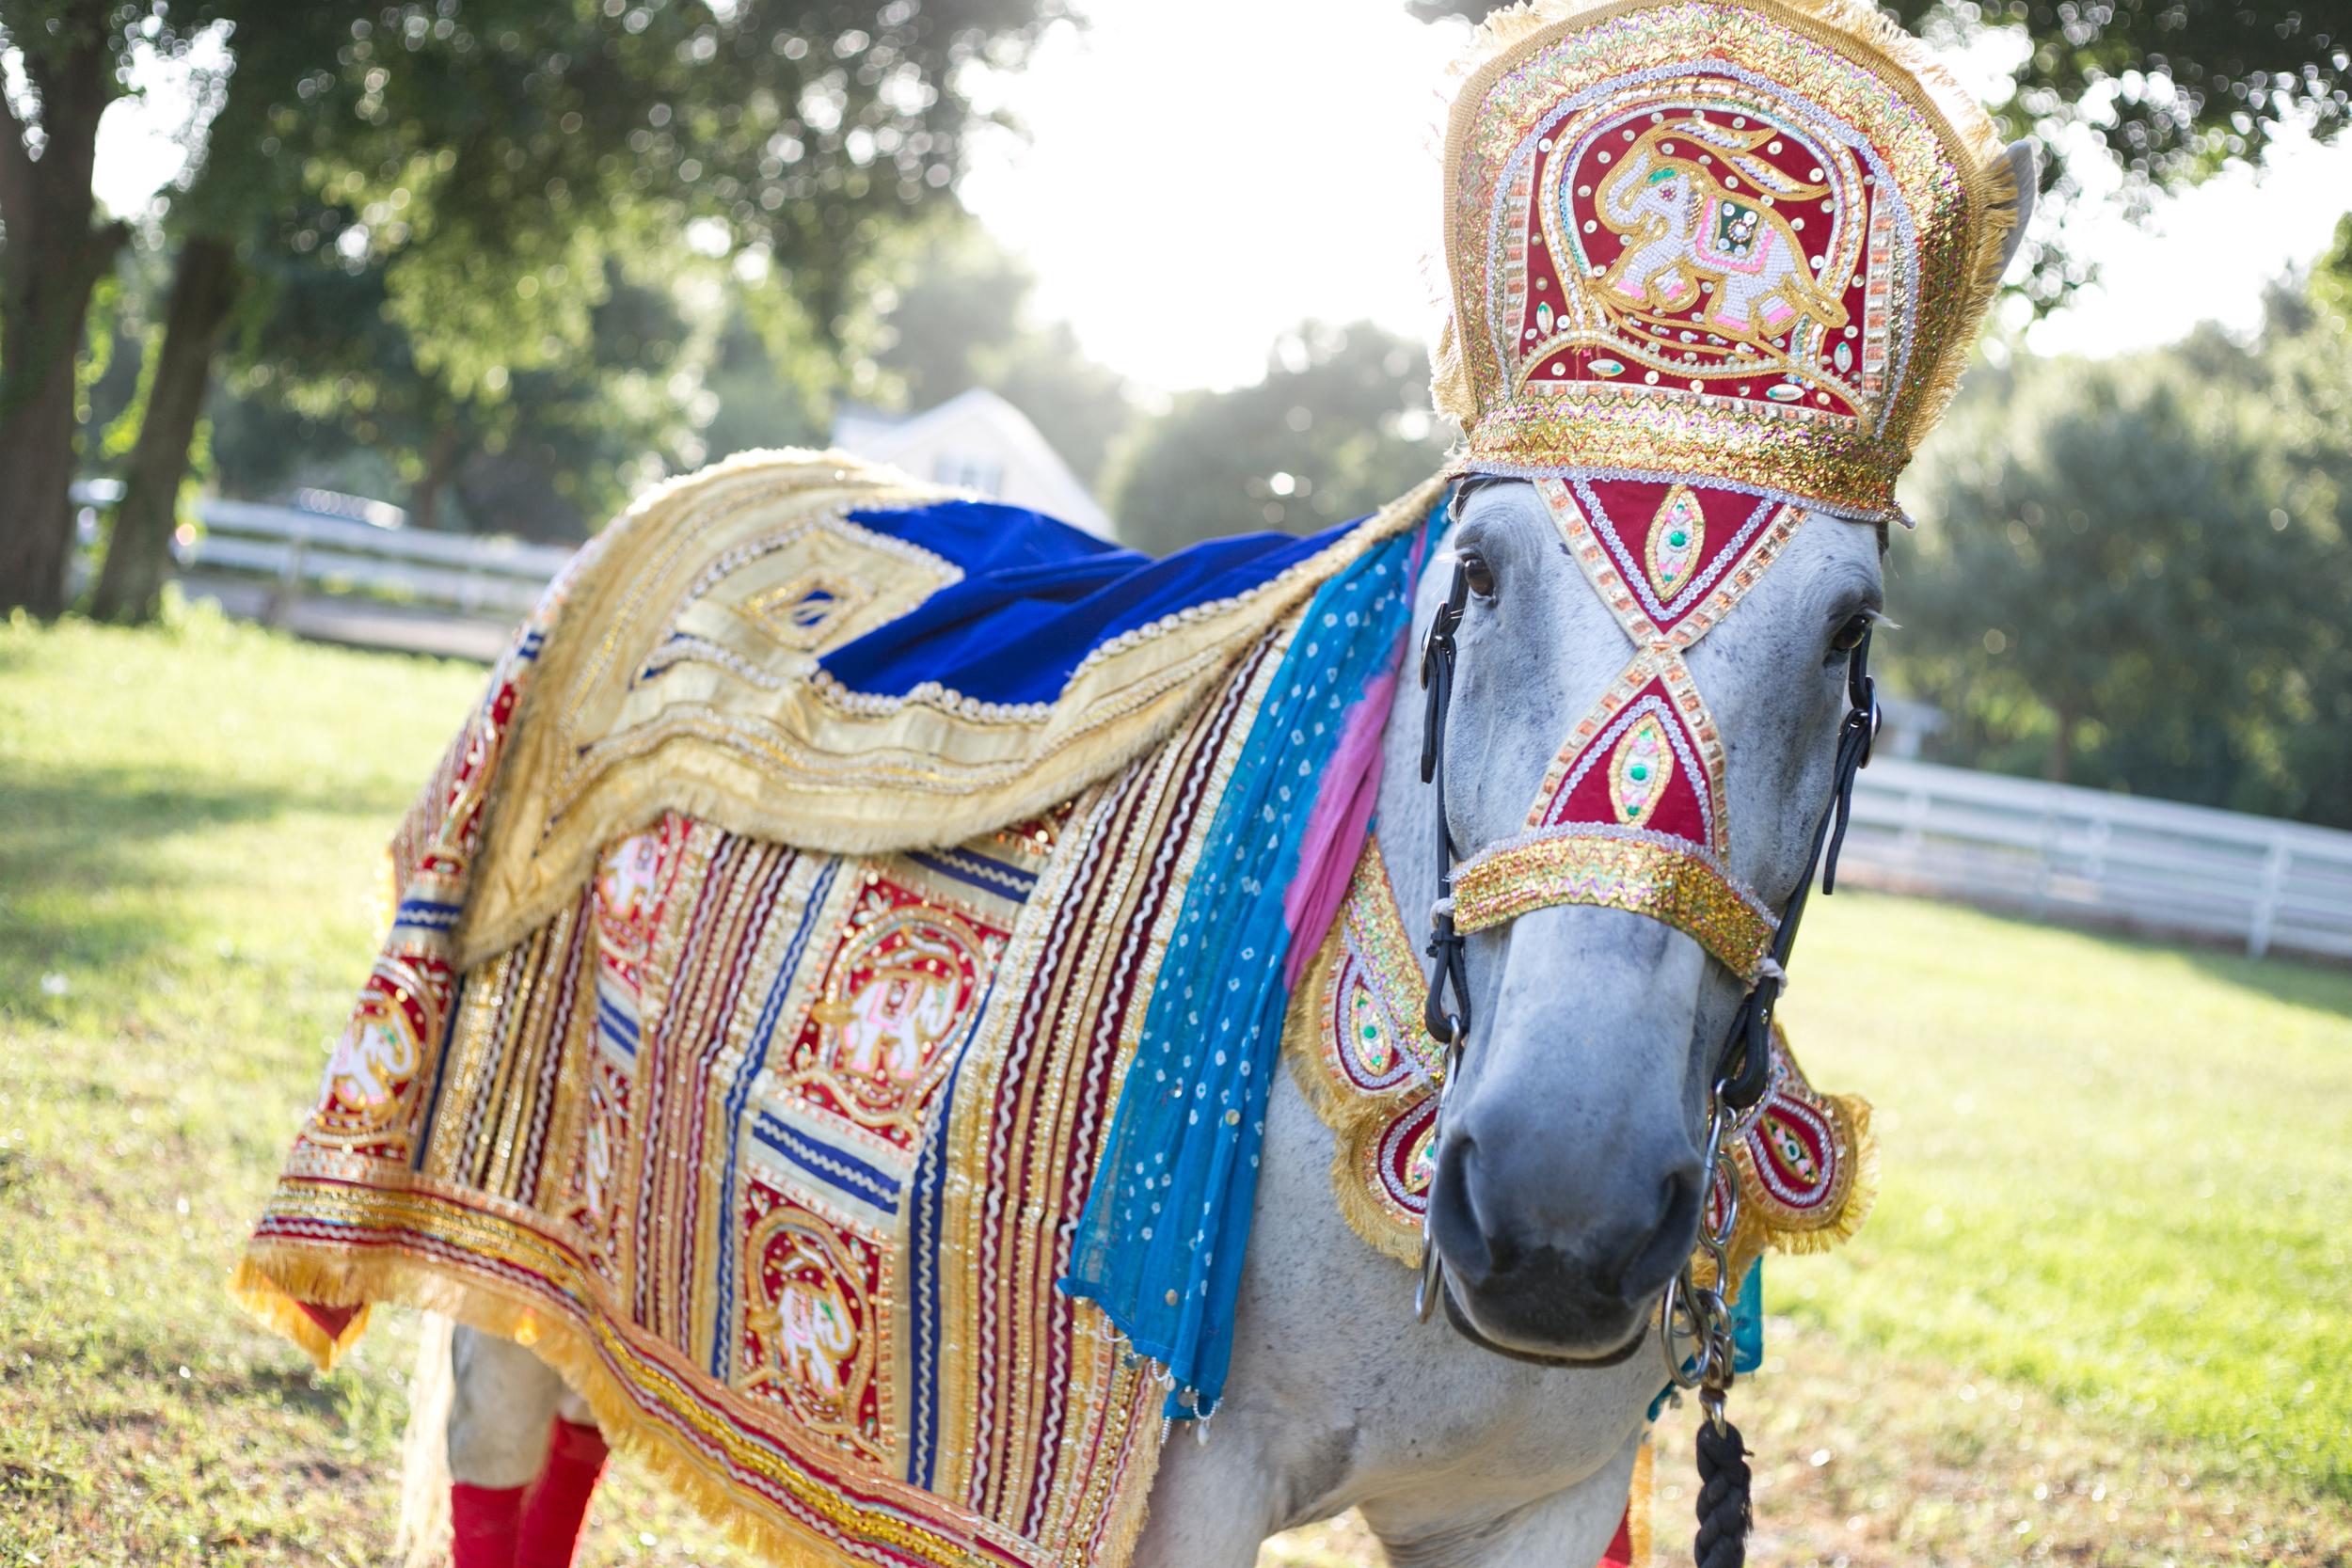 Indian South Asian Orlando Horse Carriage